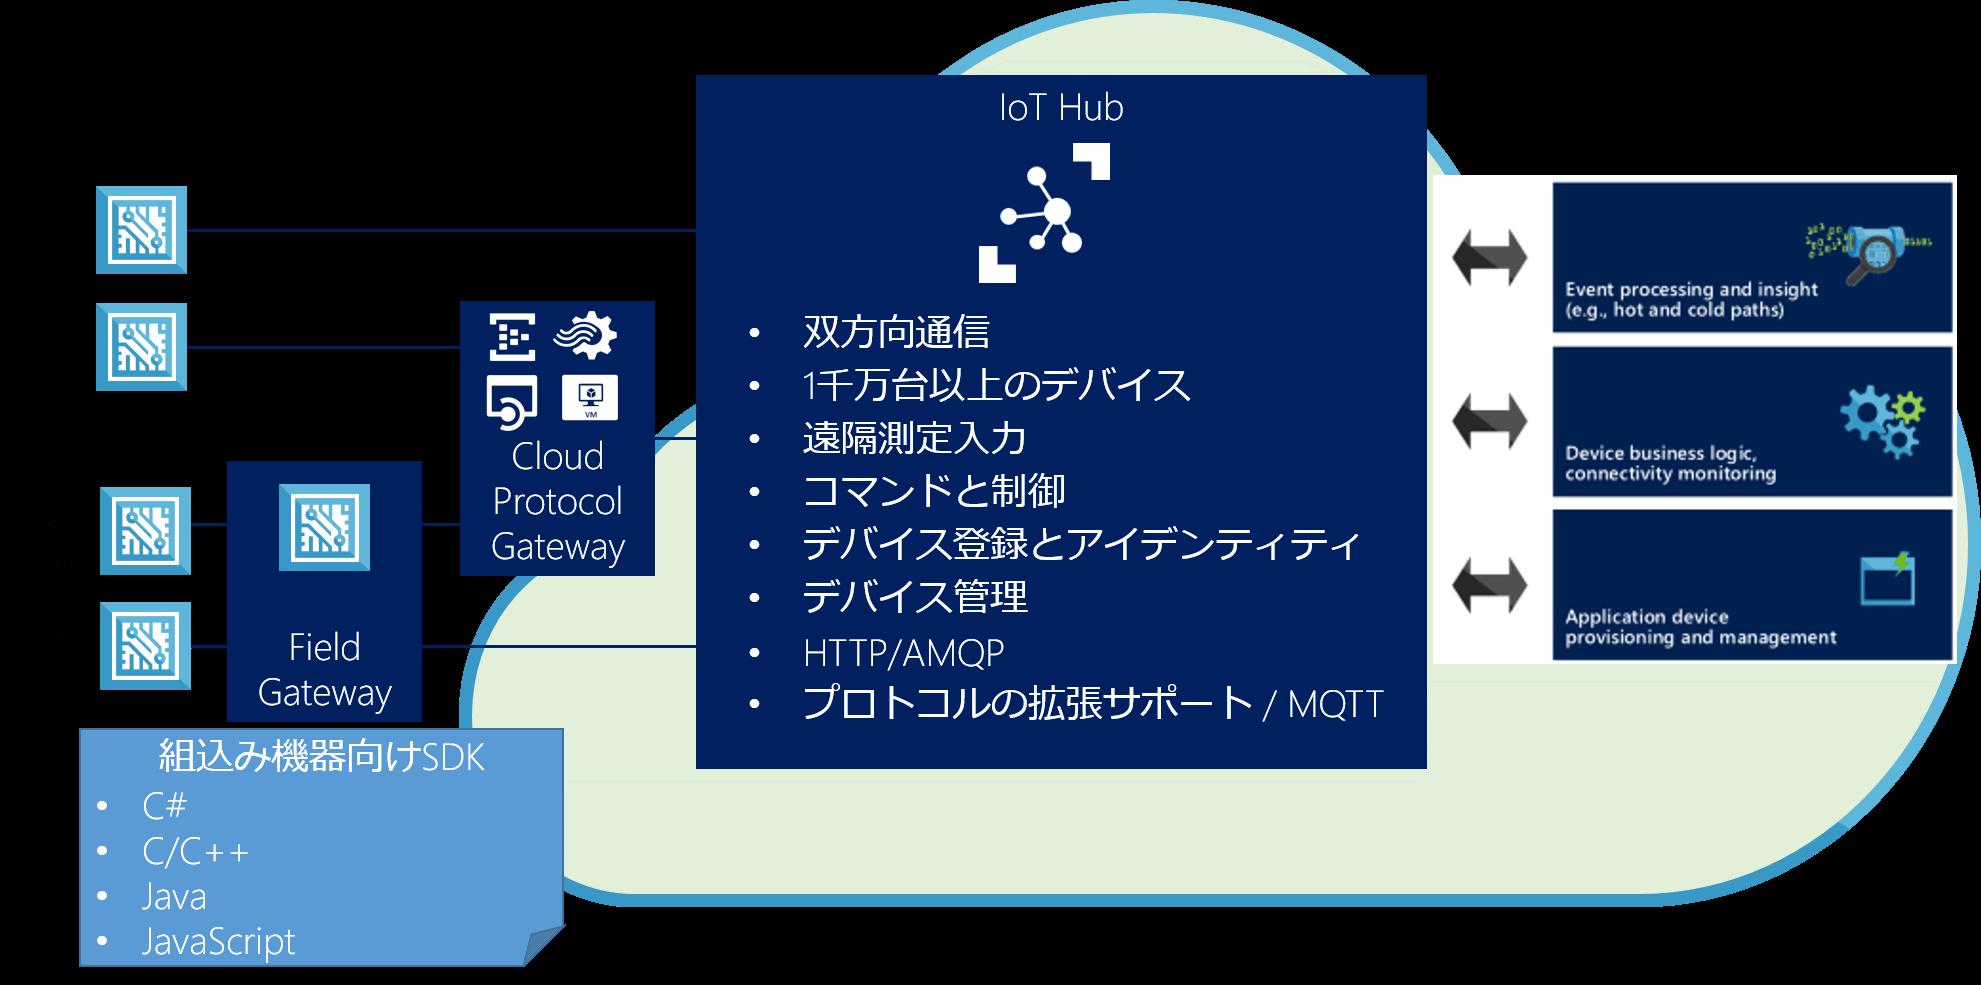 Azure IoT Hub#1